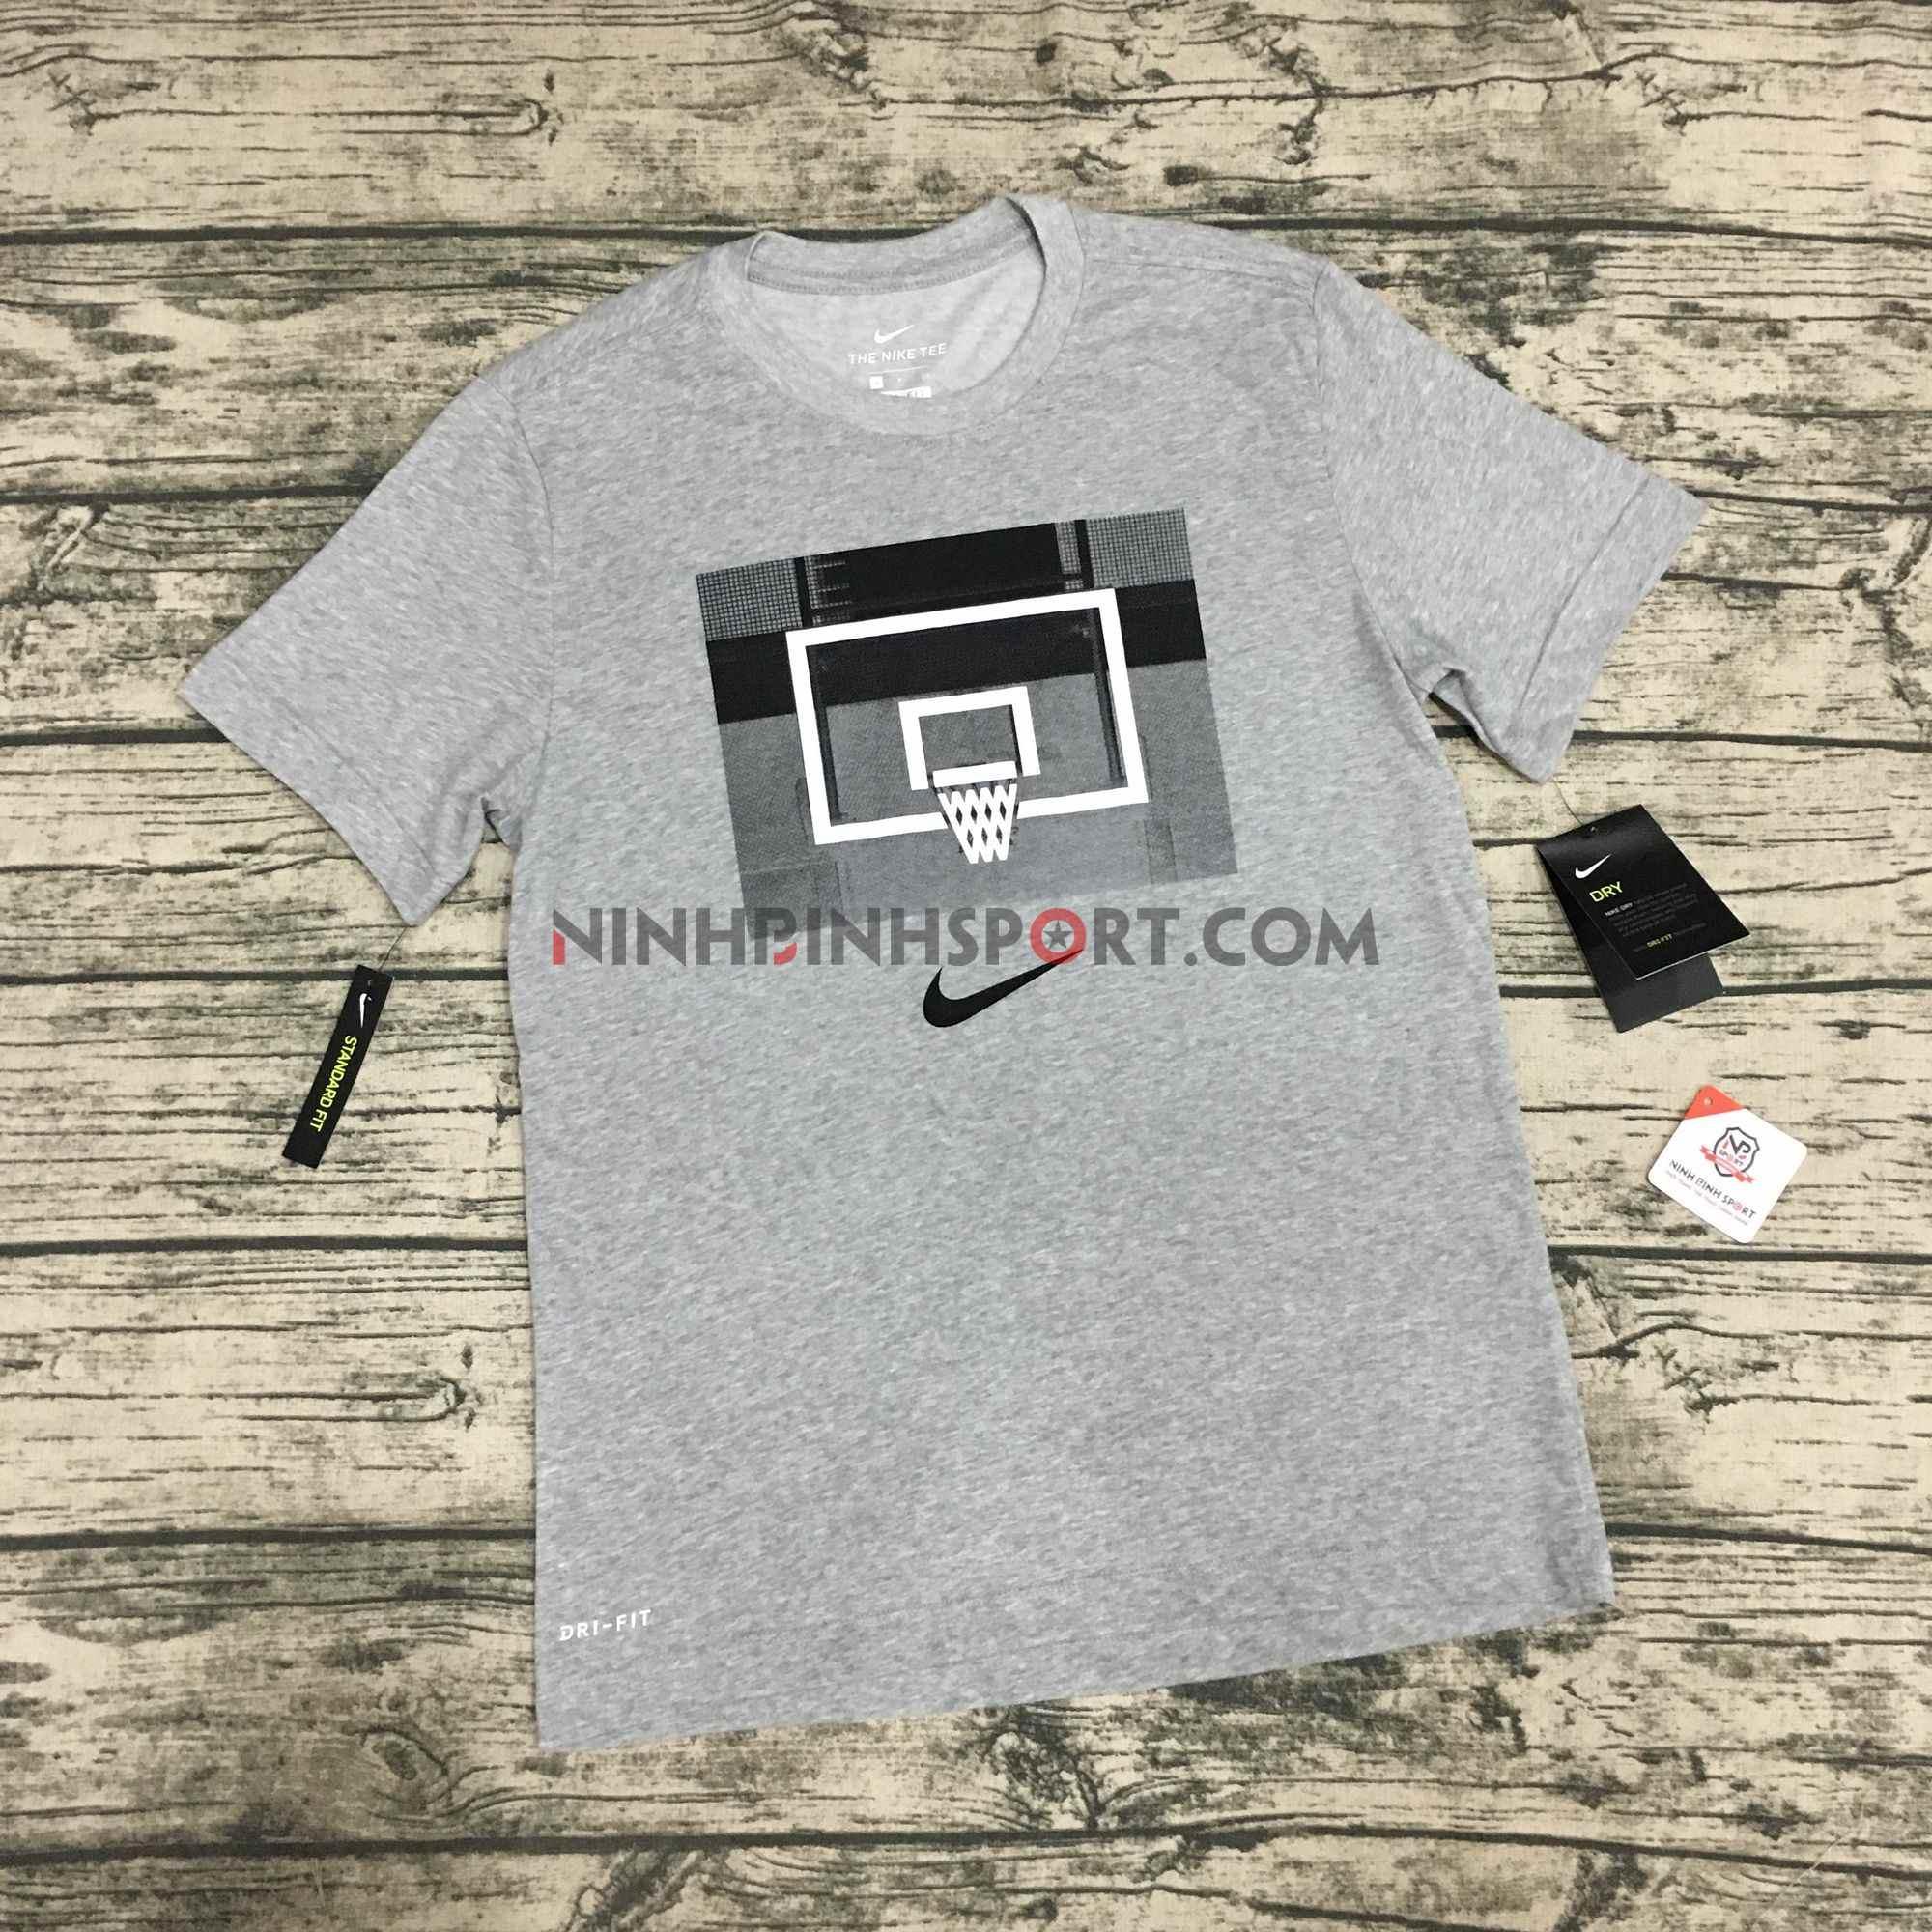 Áo thể thao nam Nike Backboard Tee AJ9650-063